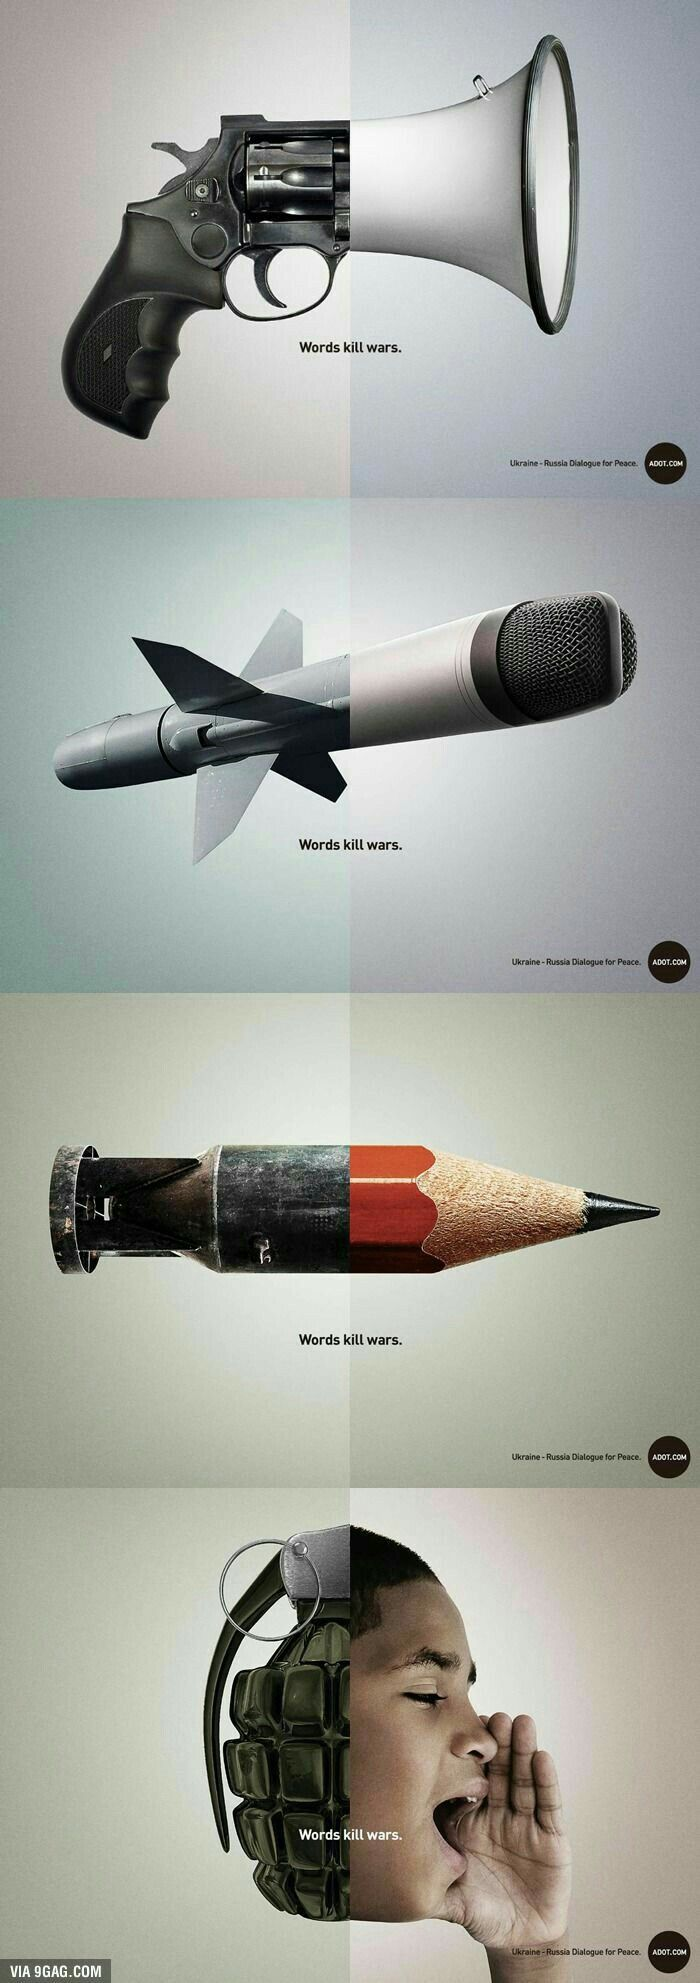 Words Kill Wars._